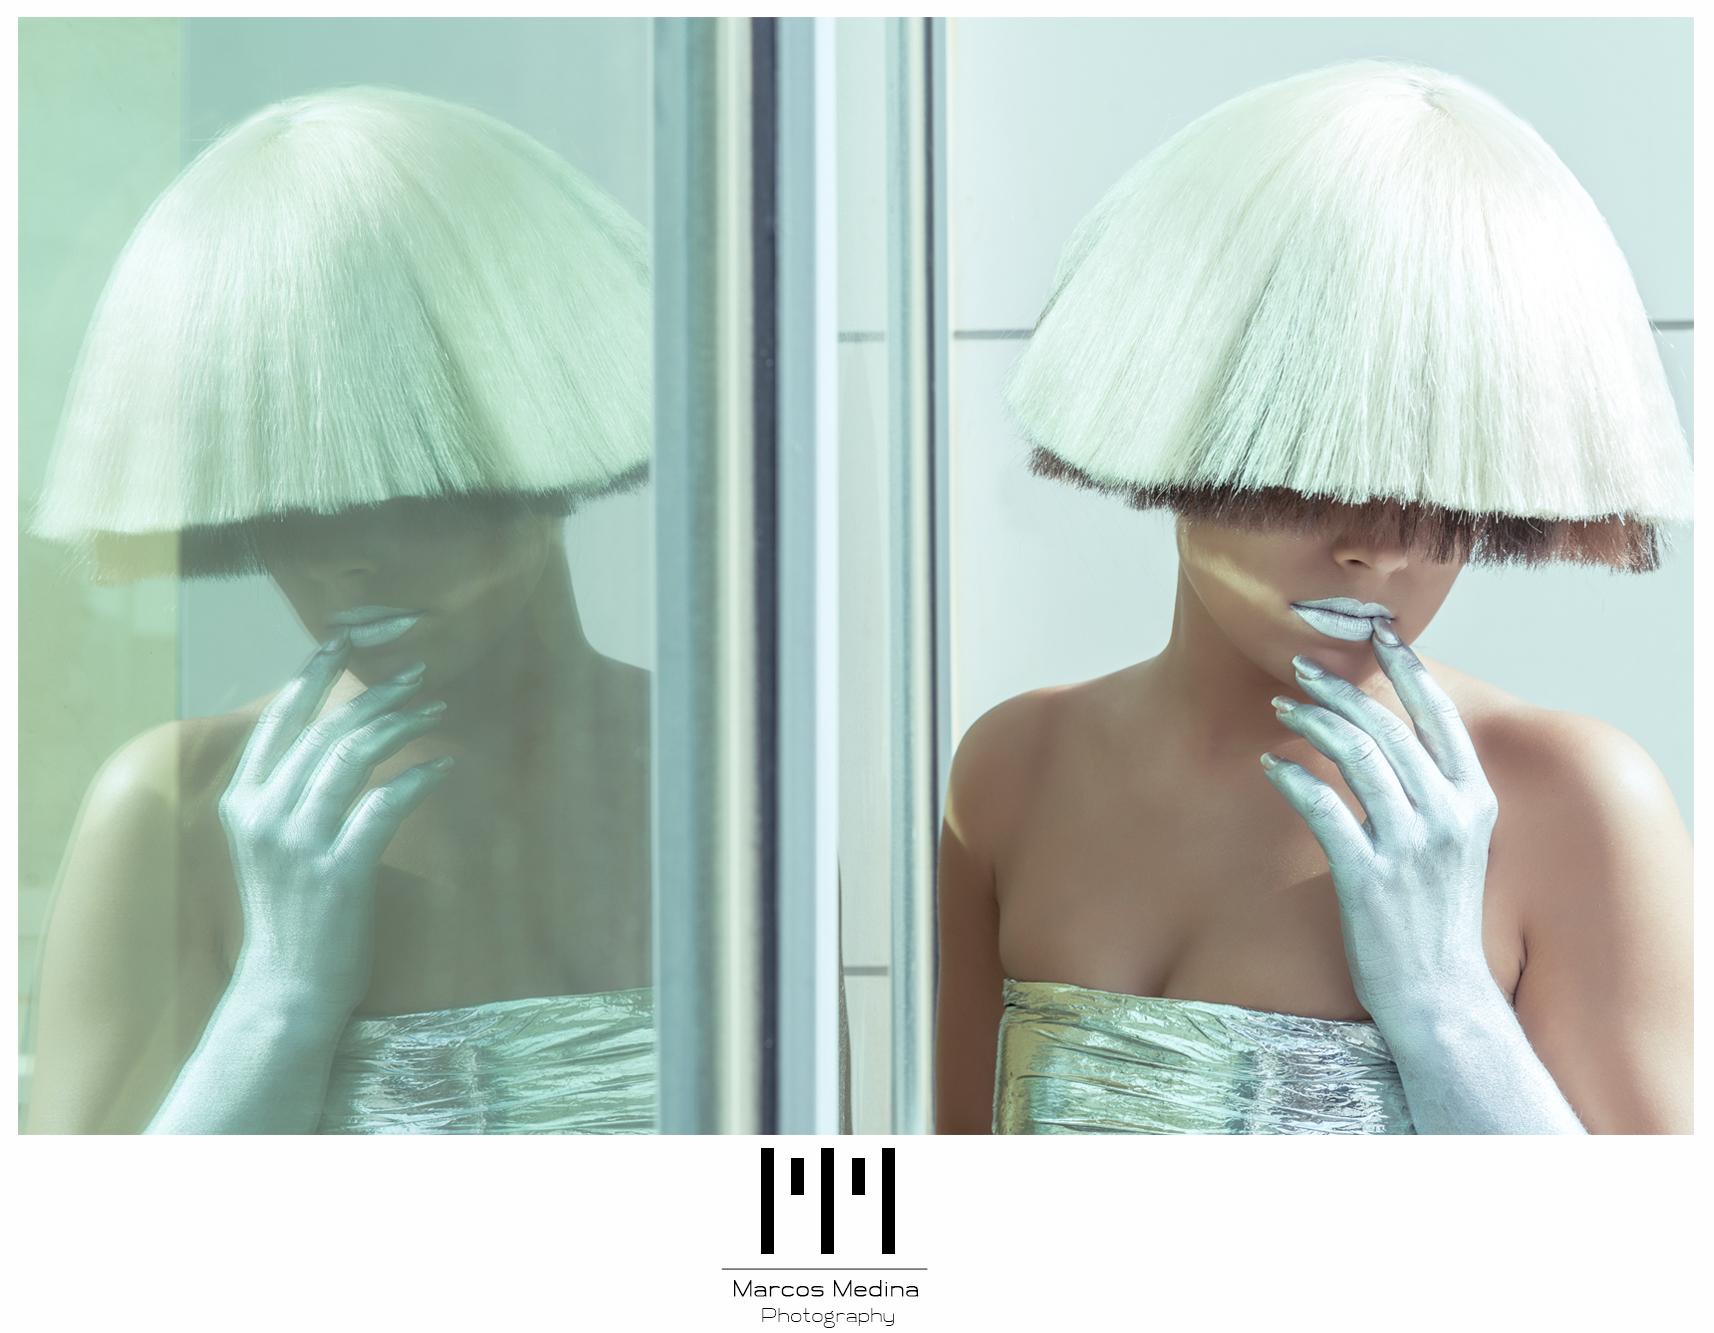 Marcos_Medina_Photography_Fashion_Futurista_4